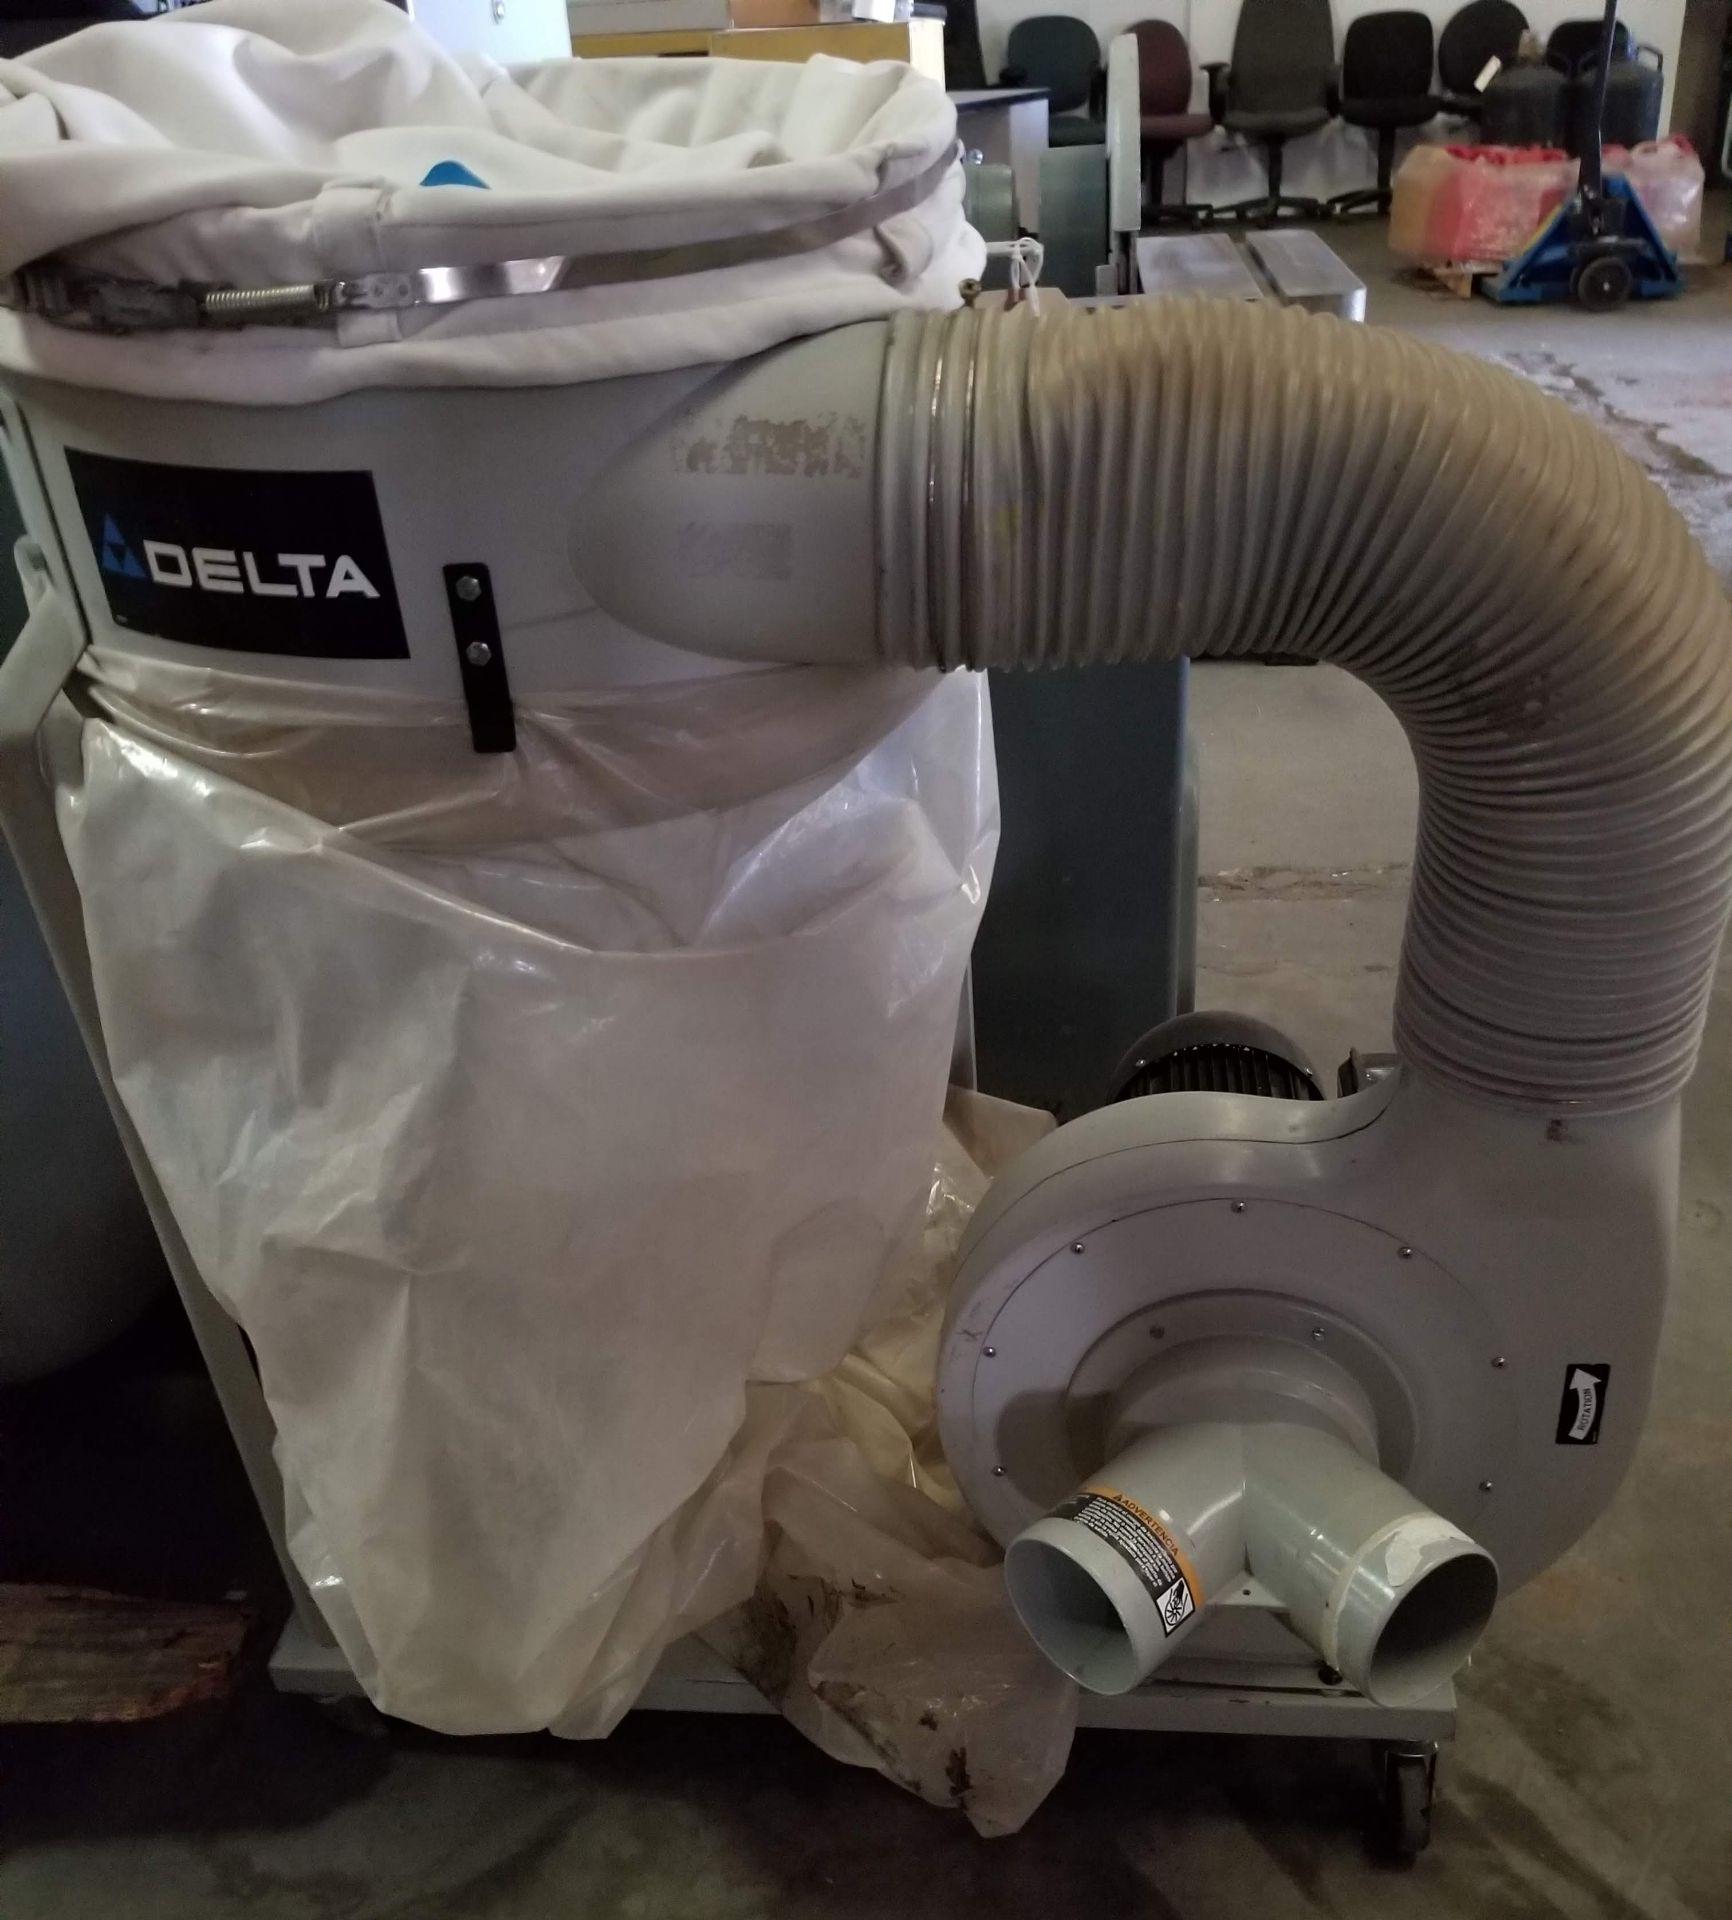 Lot 20 - Delta Dust Collector, 1.5hp 110V, Model # 50-850